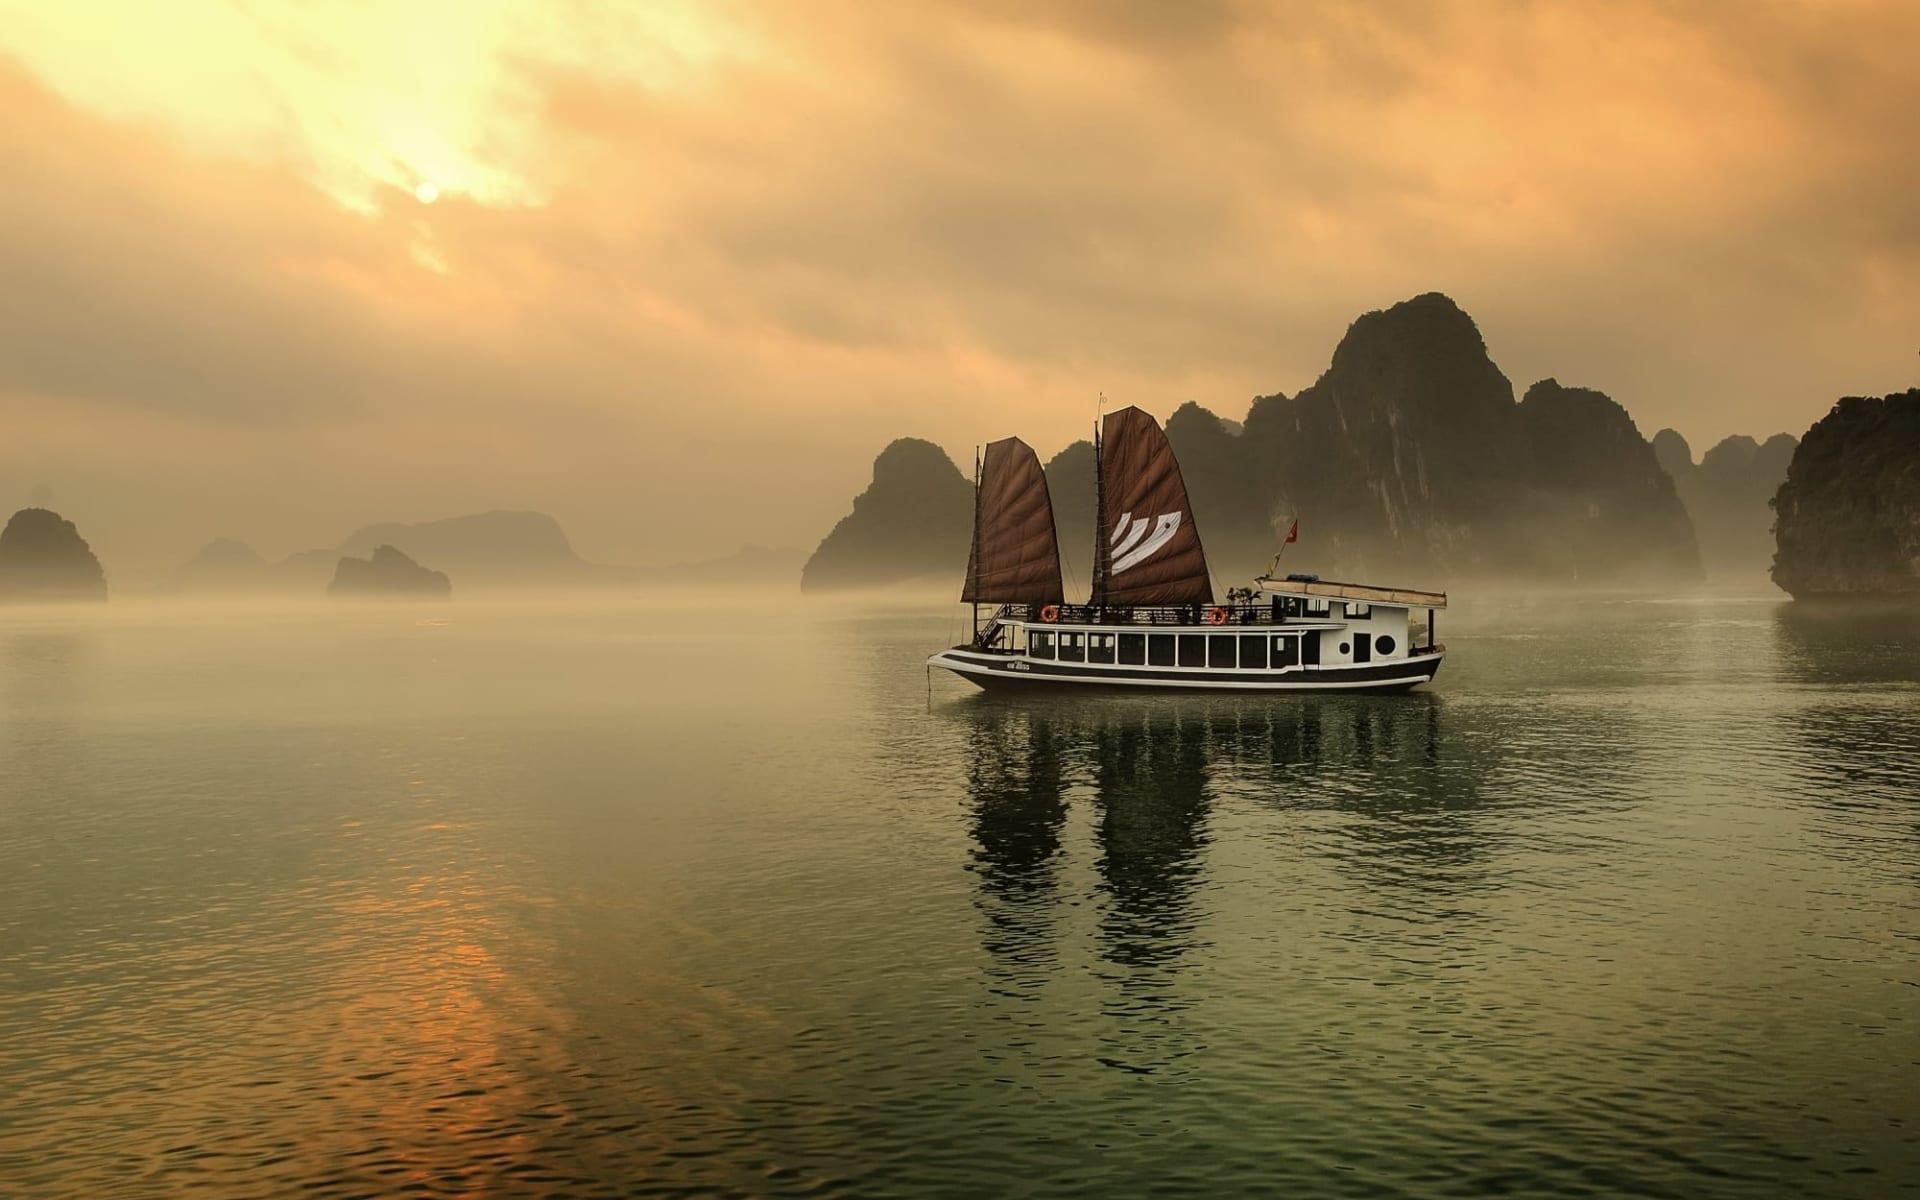 Halong Bucht Kreuzfahrten mit «Legend Halong» Privatboot ab Hanoi: Bhaya-Legend-on-the-sunset